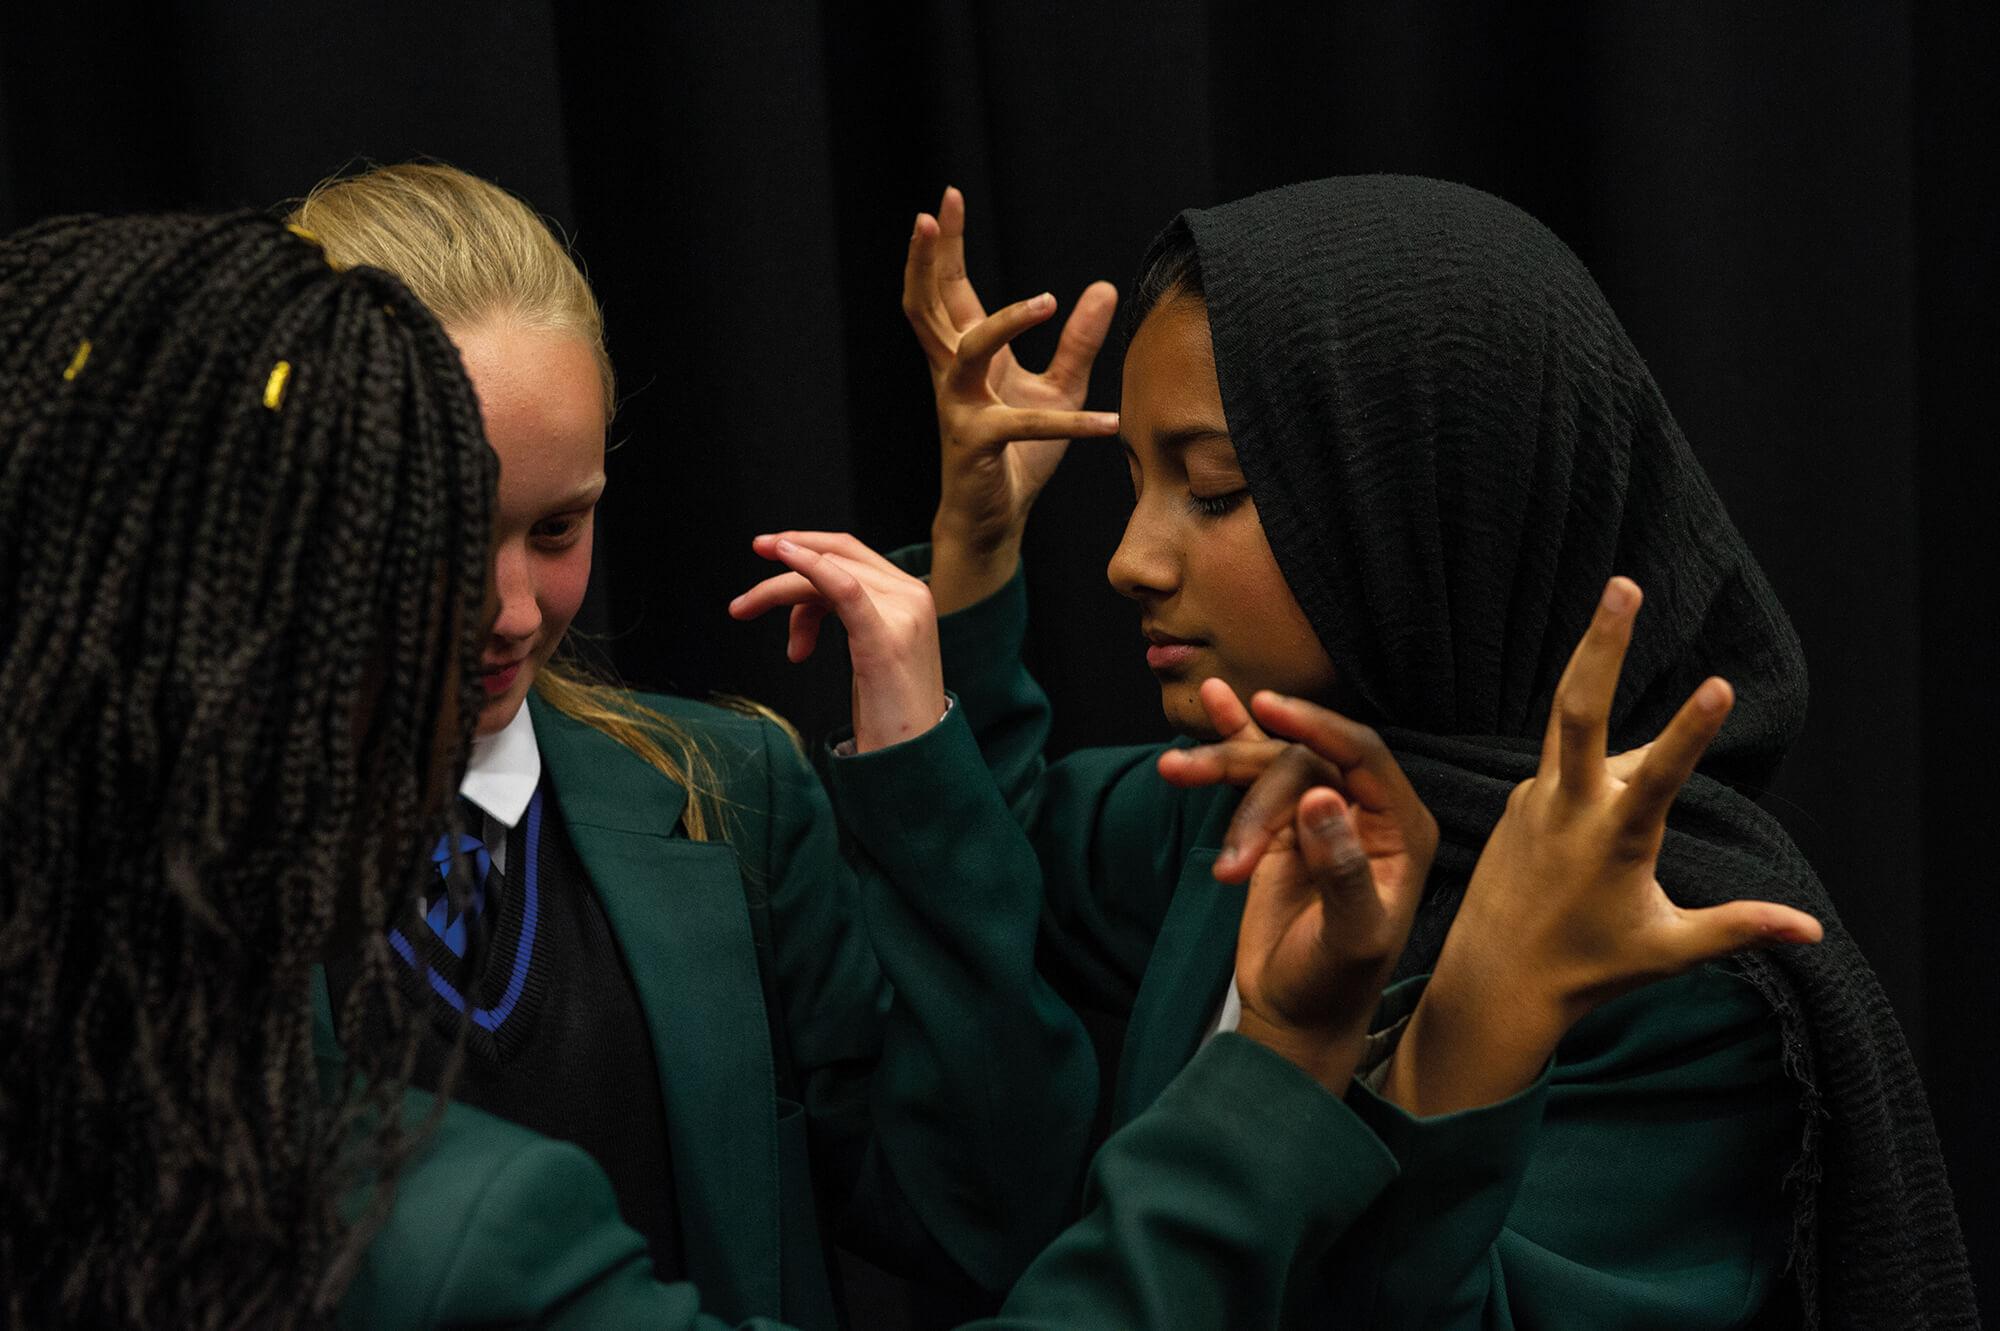 Drama Students at Lord Grey Academy